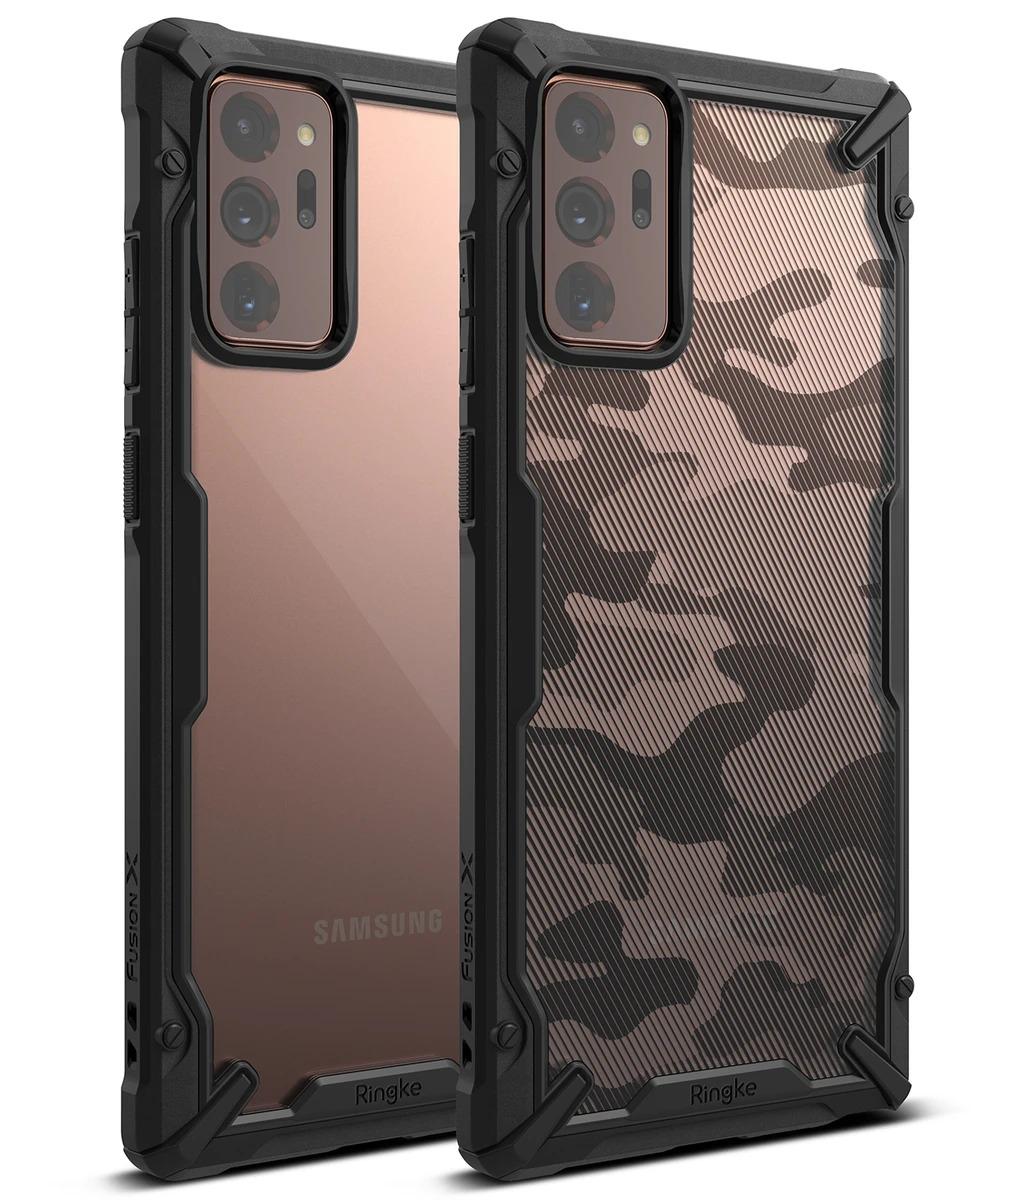 Samsung Galaxy S21 Ultra Fusion X Ringke Camo Black MIL STD 810G-516.6 image